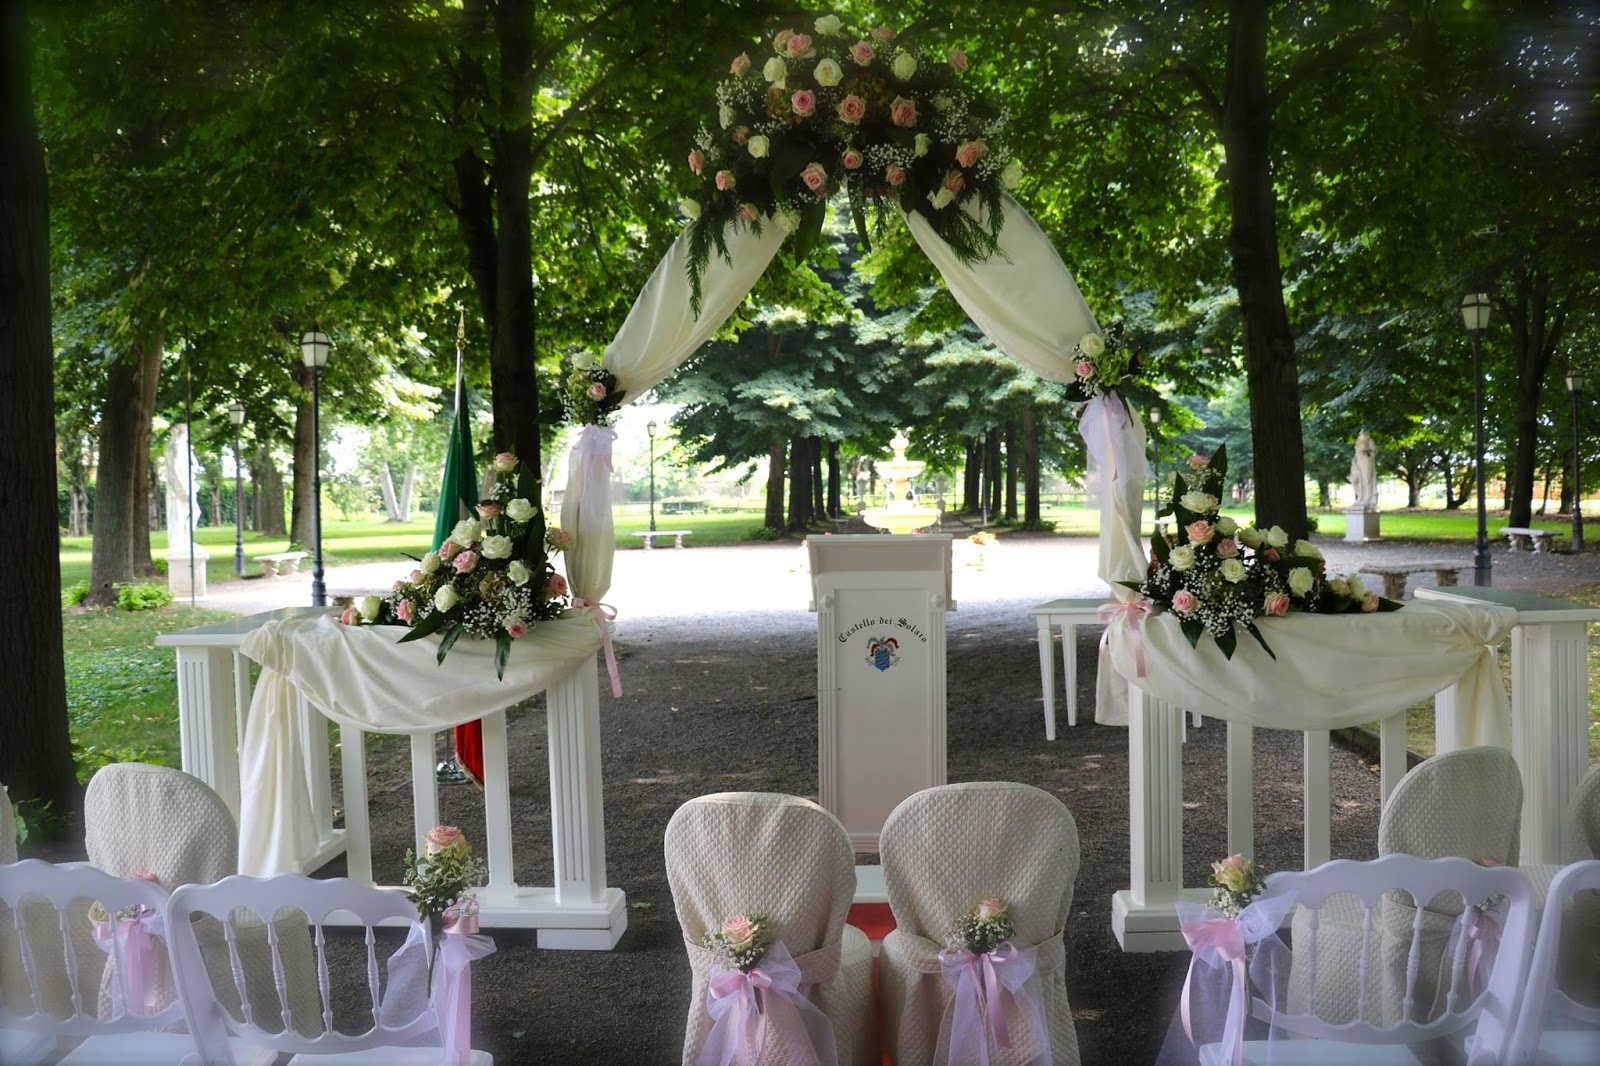 Matrimonio Simbolico In Chiesa : Cerimonie eventi wedding planner pordenone friuli venezia